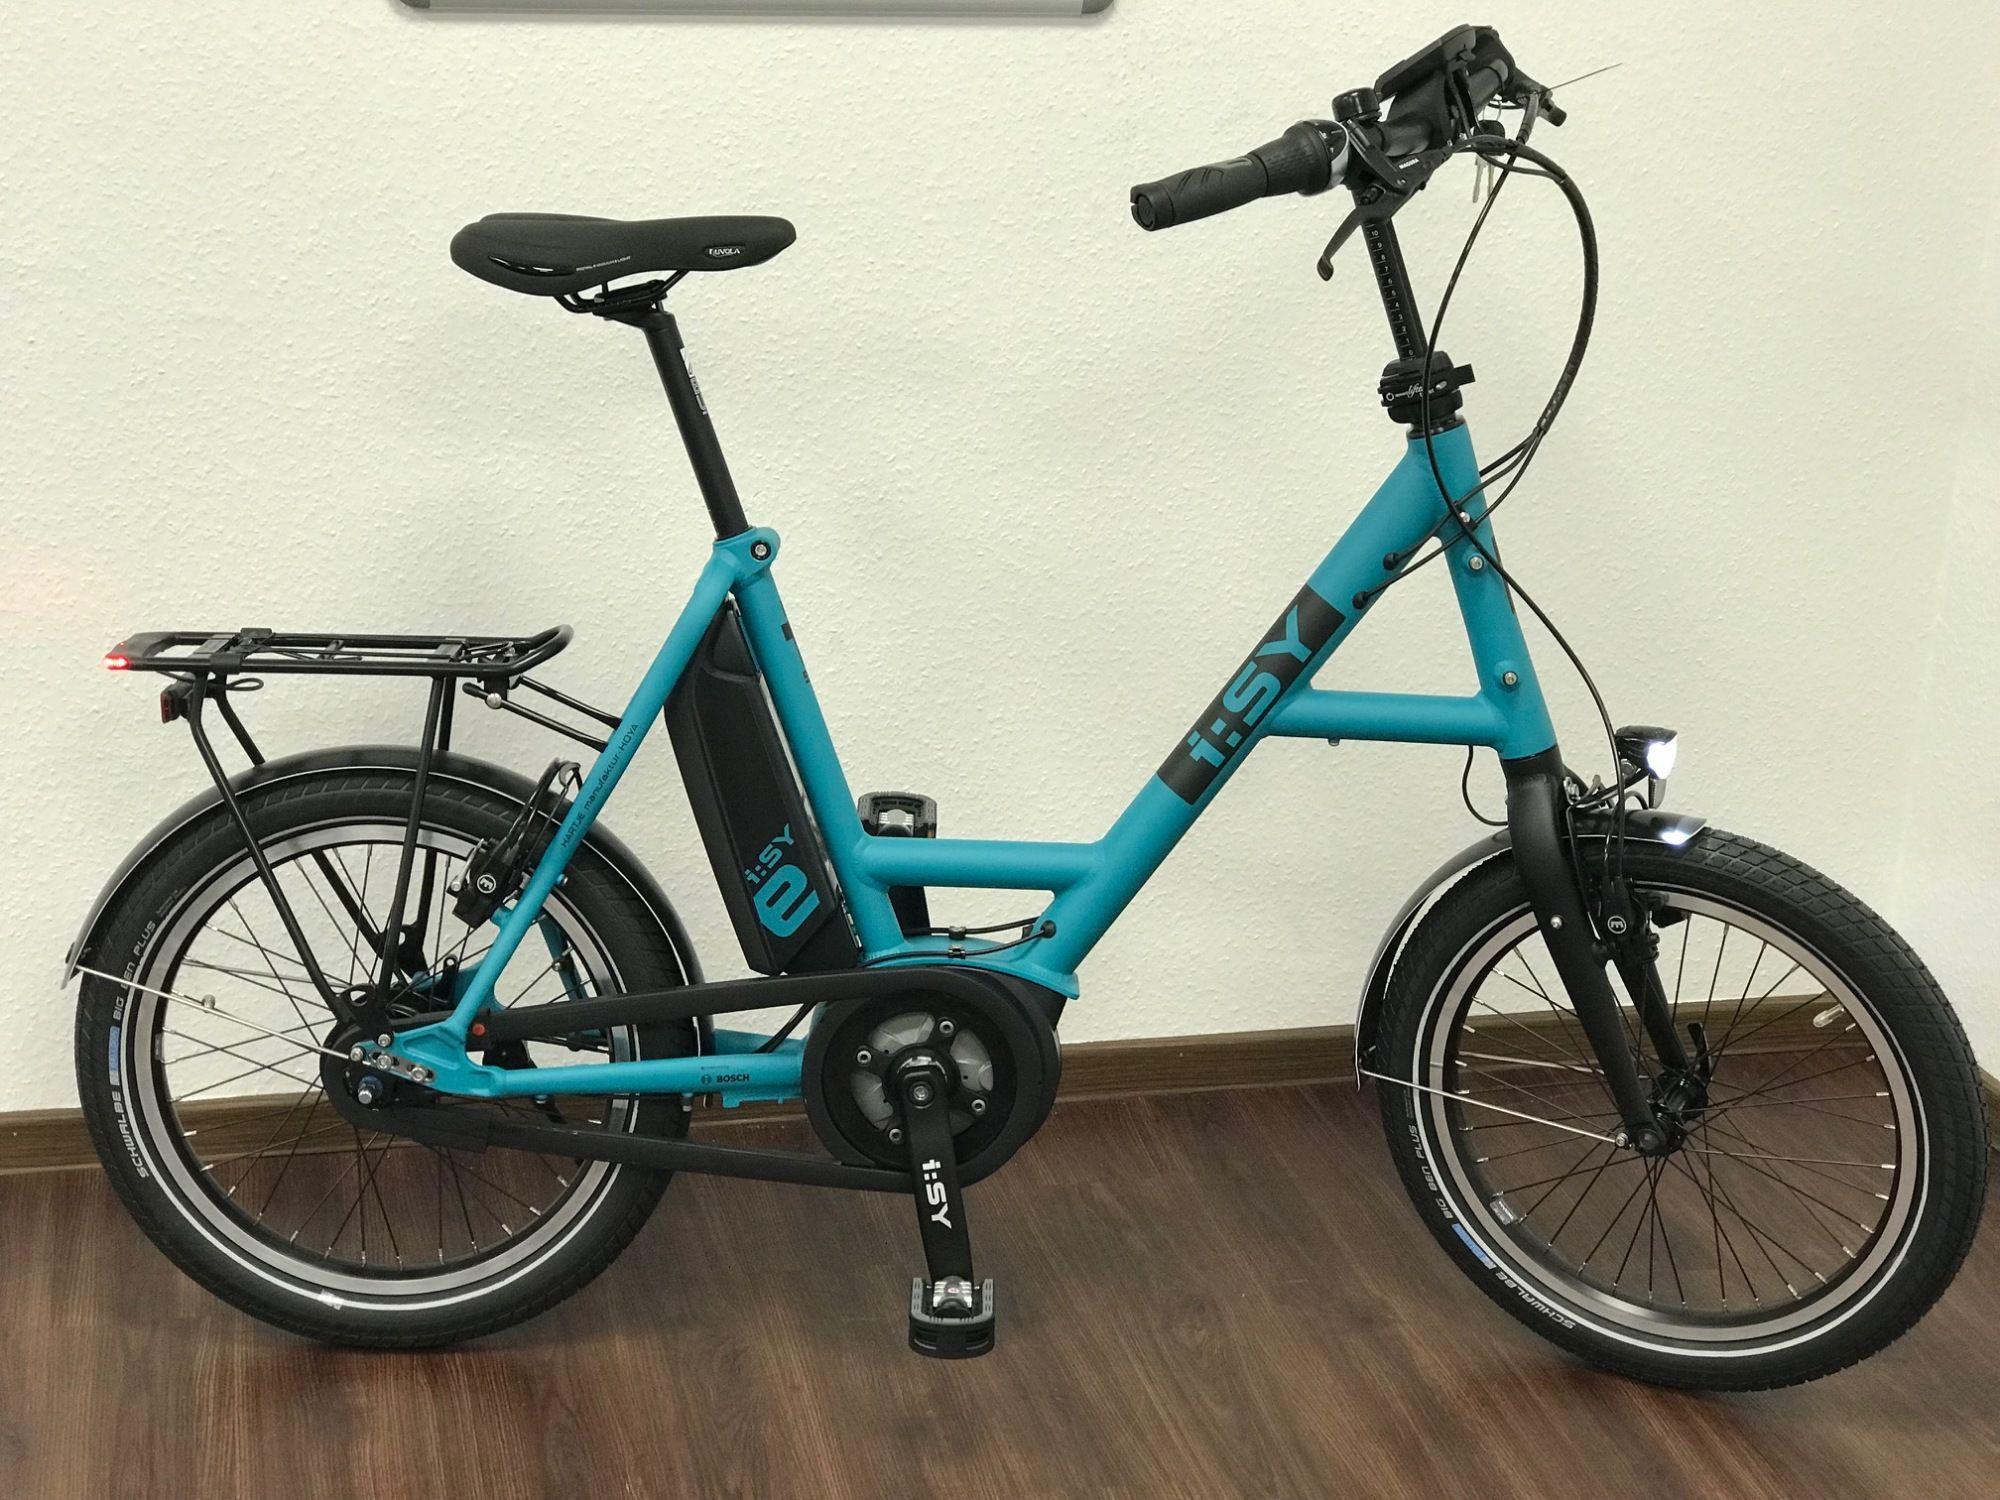 isy e bike pedelec s8 2019 wasserblau. Black Bedroom Furniture Sets. Home Design Ideas